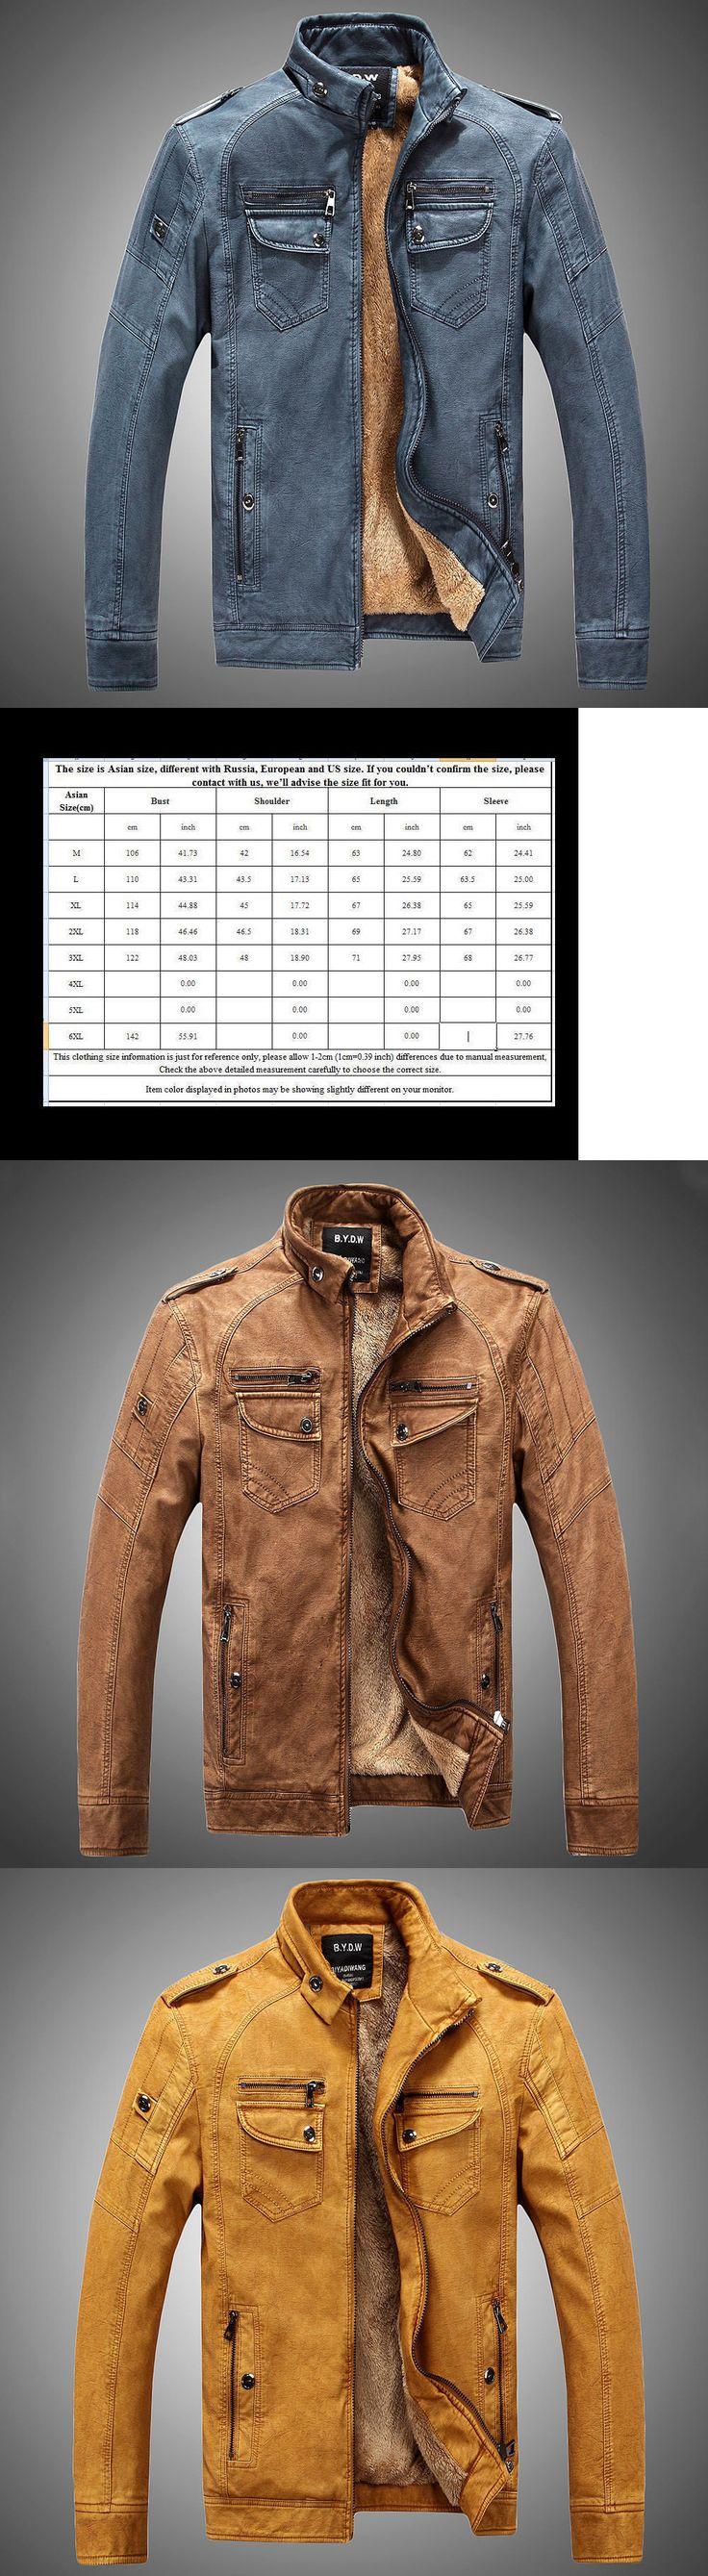 Men Coats And Jackets: 2017Men S Genuine Lambskin Leather Jacket Black Slim Fit Biker Motorcycle Jacket -> BUY IT NOW ONLY: $33.96 on eBay!